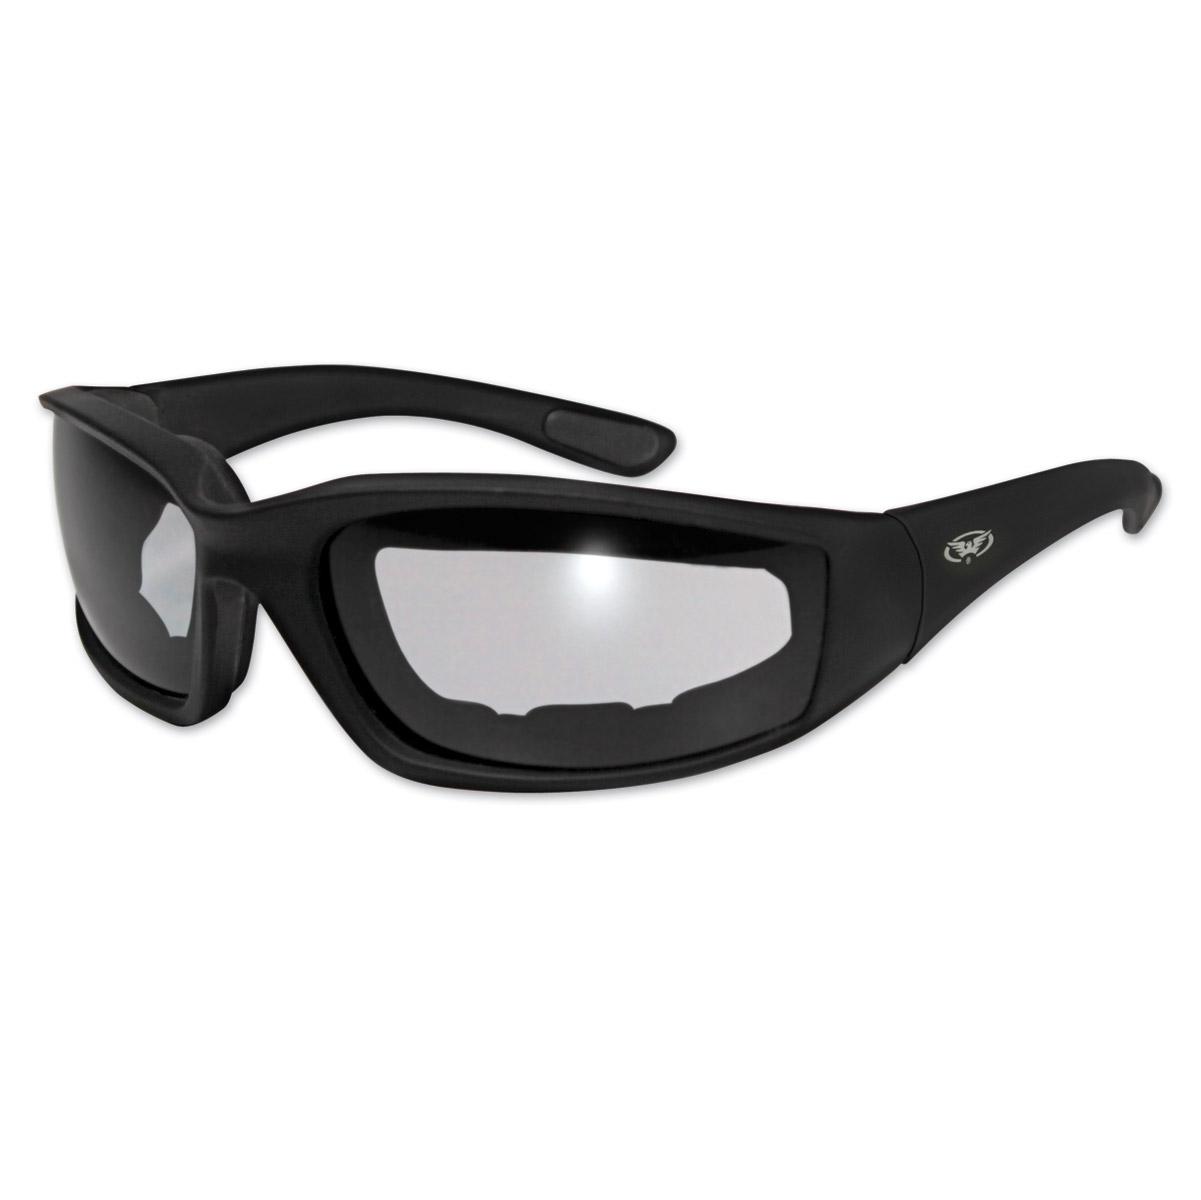 Global Vision Eyewear Kickback Smoke Photochromic Sunglasses